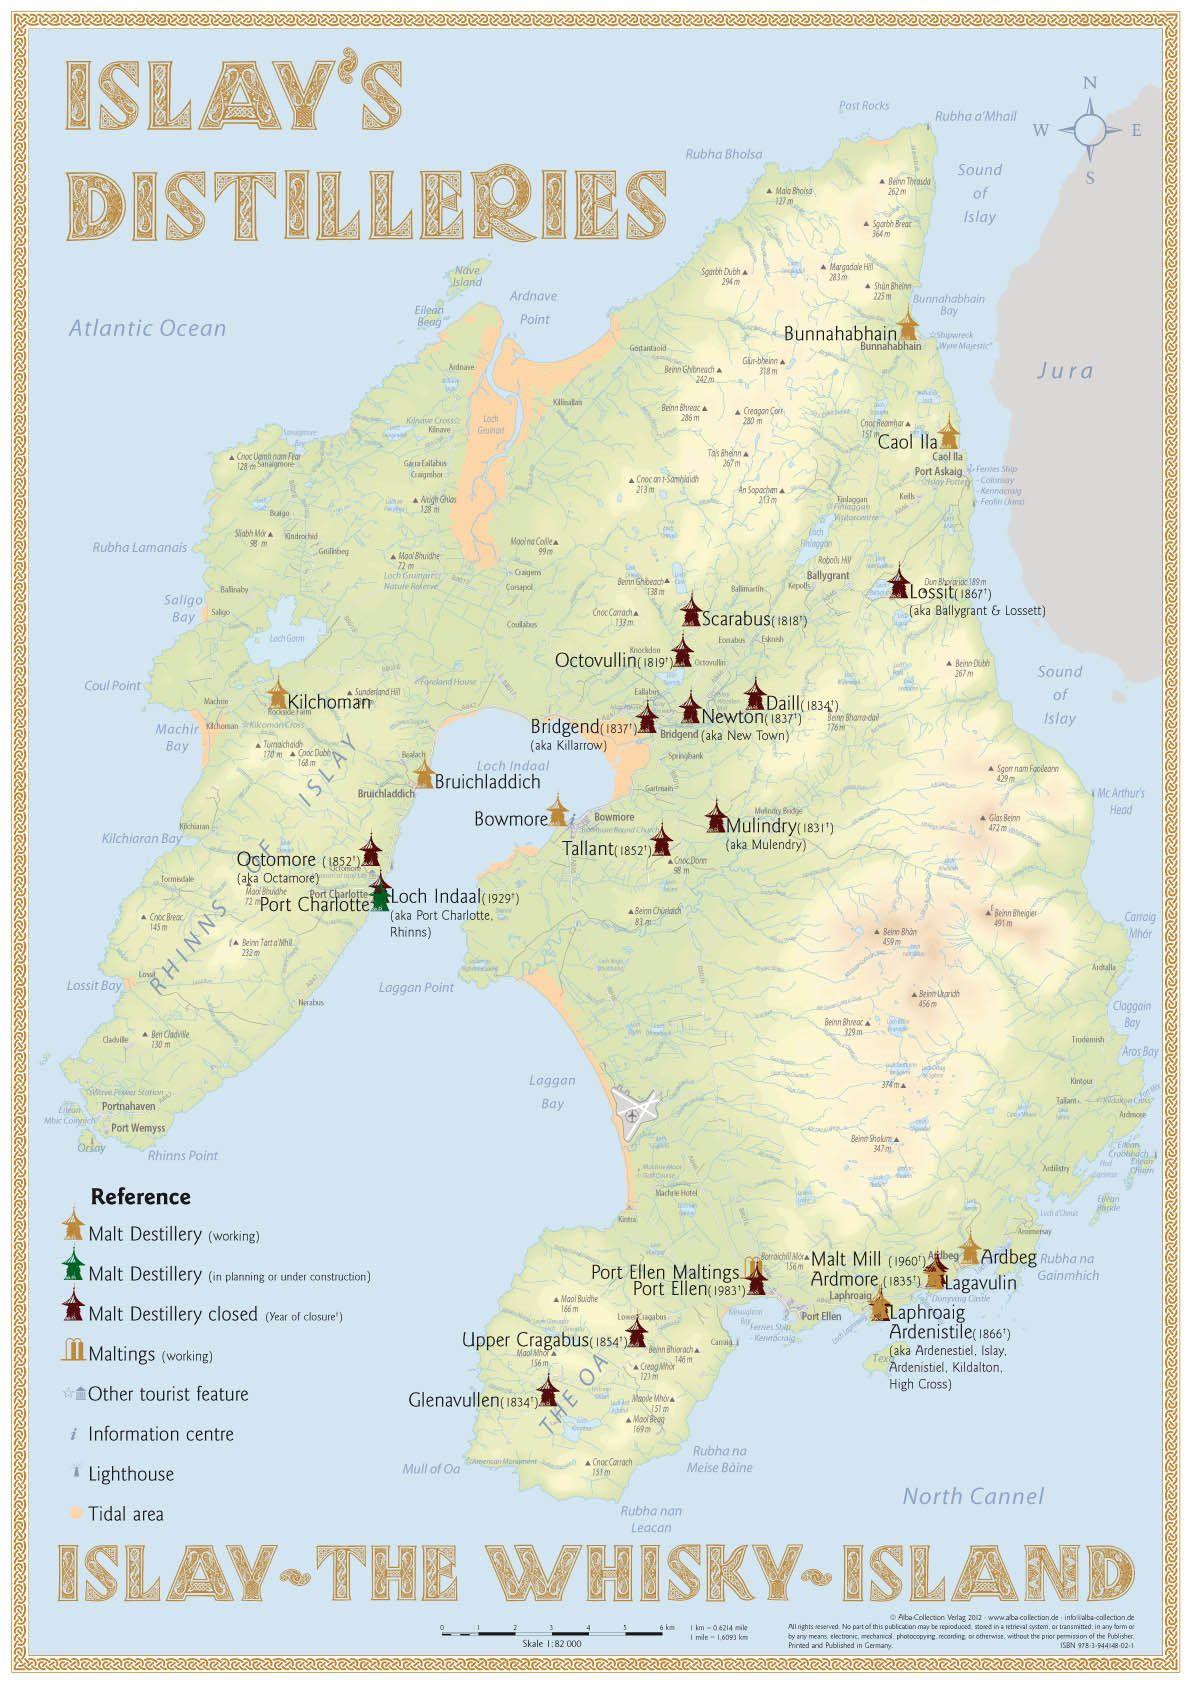 Scotland s Isle Of Islay s Whisky Distilleries